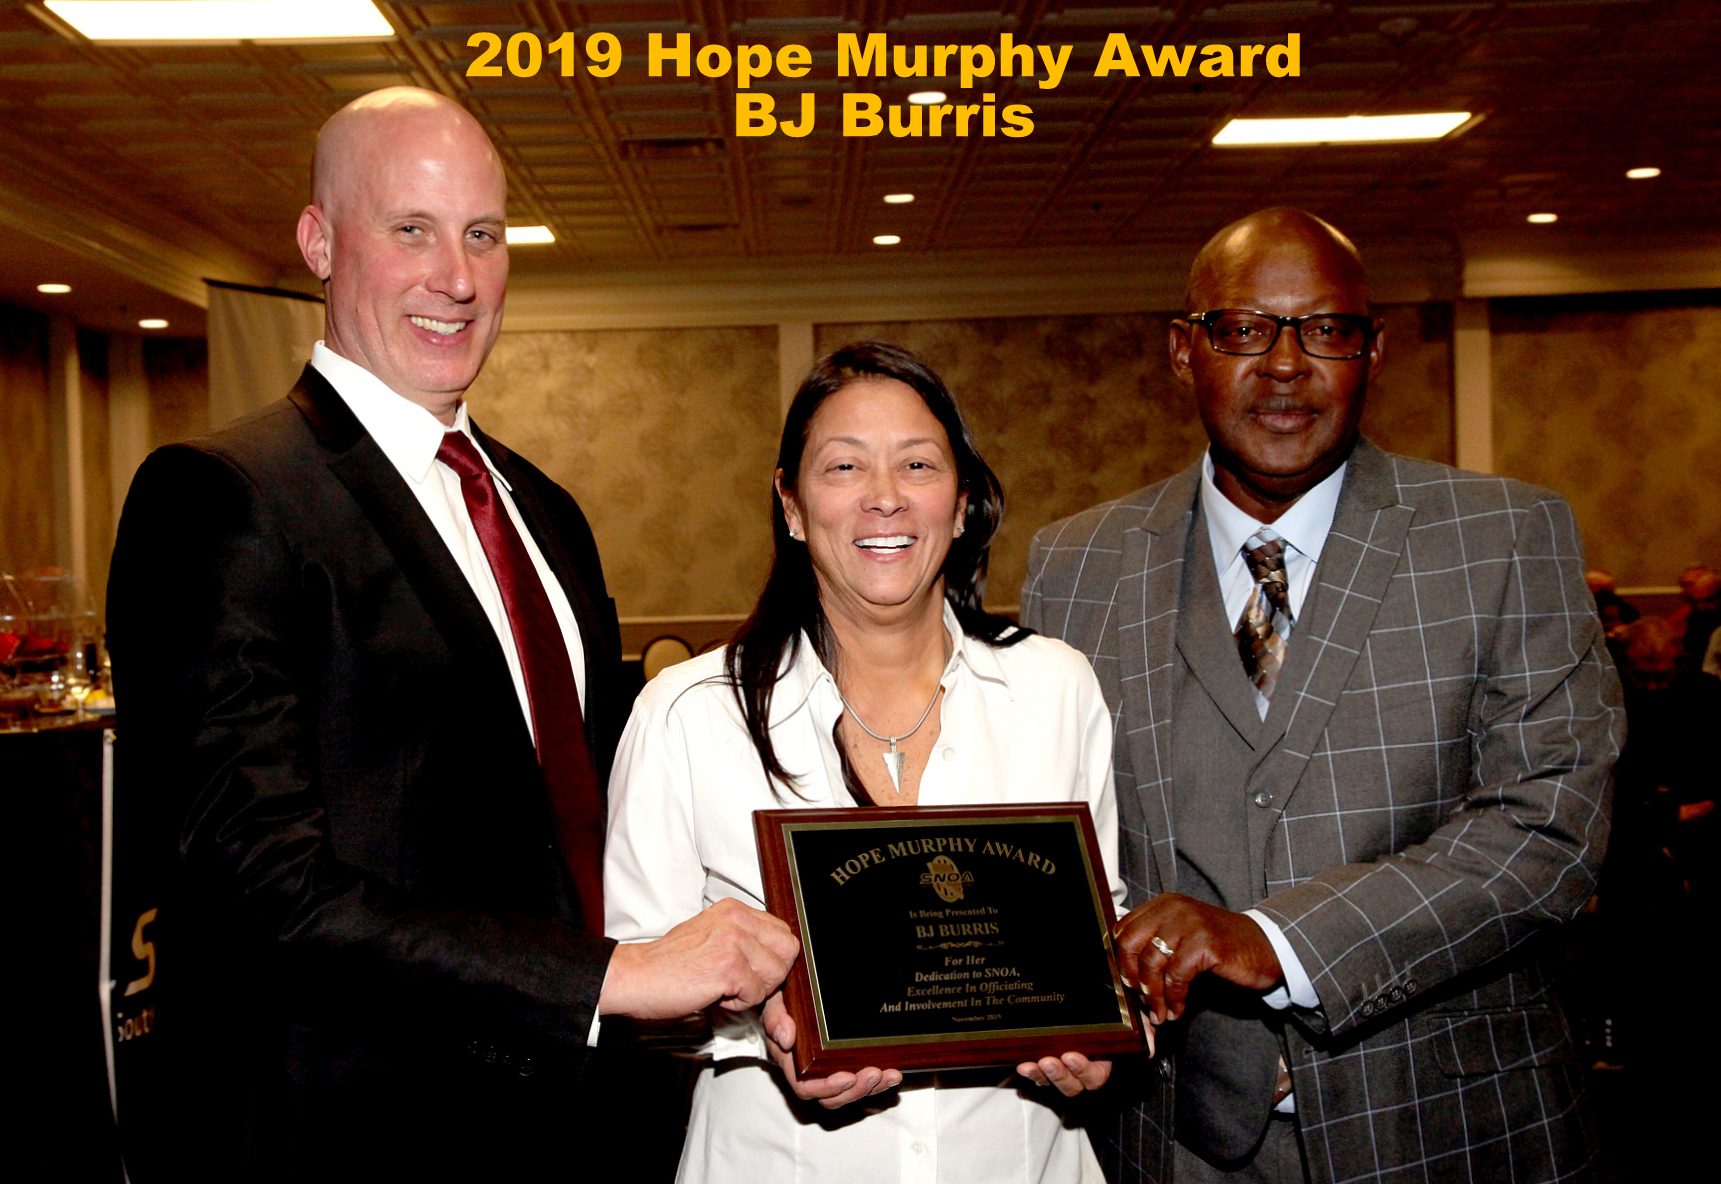 2019 Hope Murphy Award